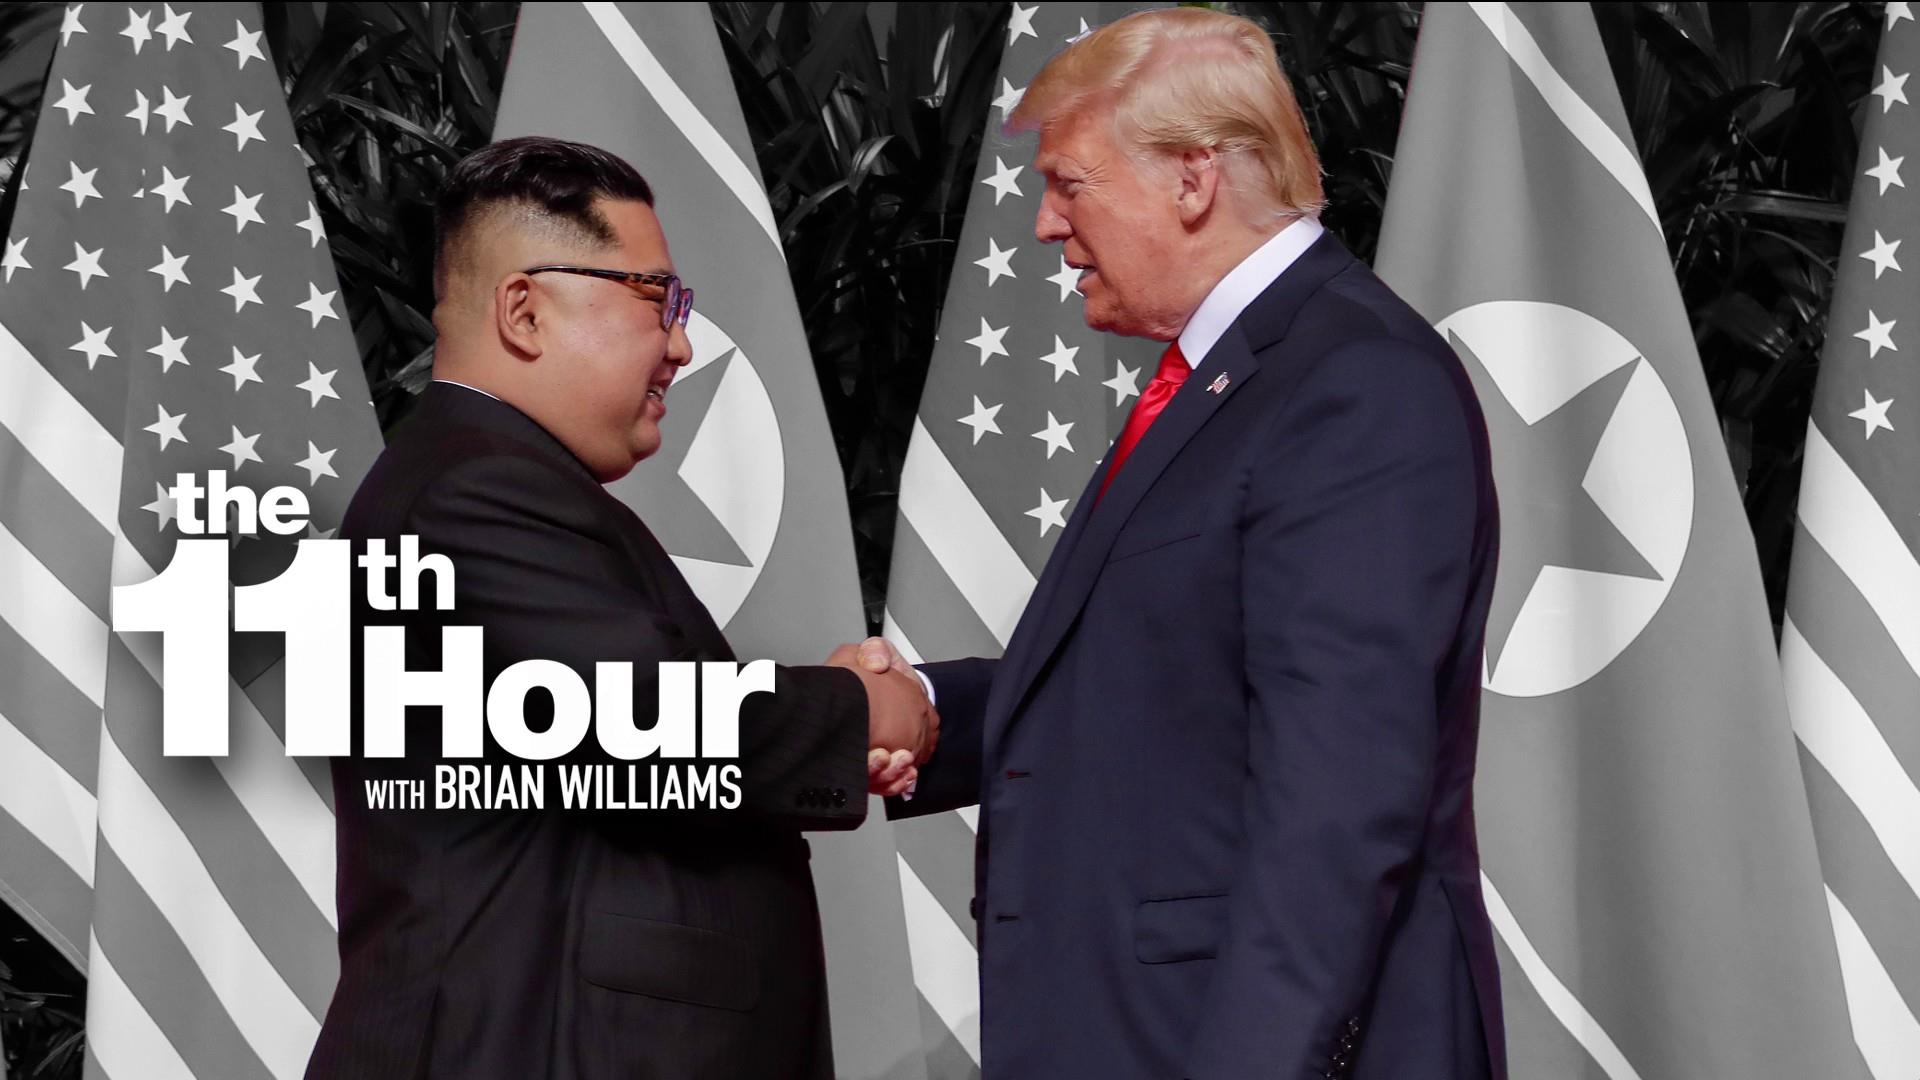 Trump on meeting Kim Jong Un in Singapore: 'It's my honor'